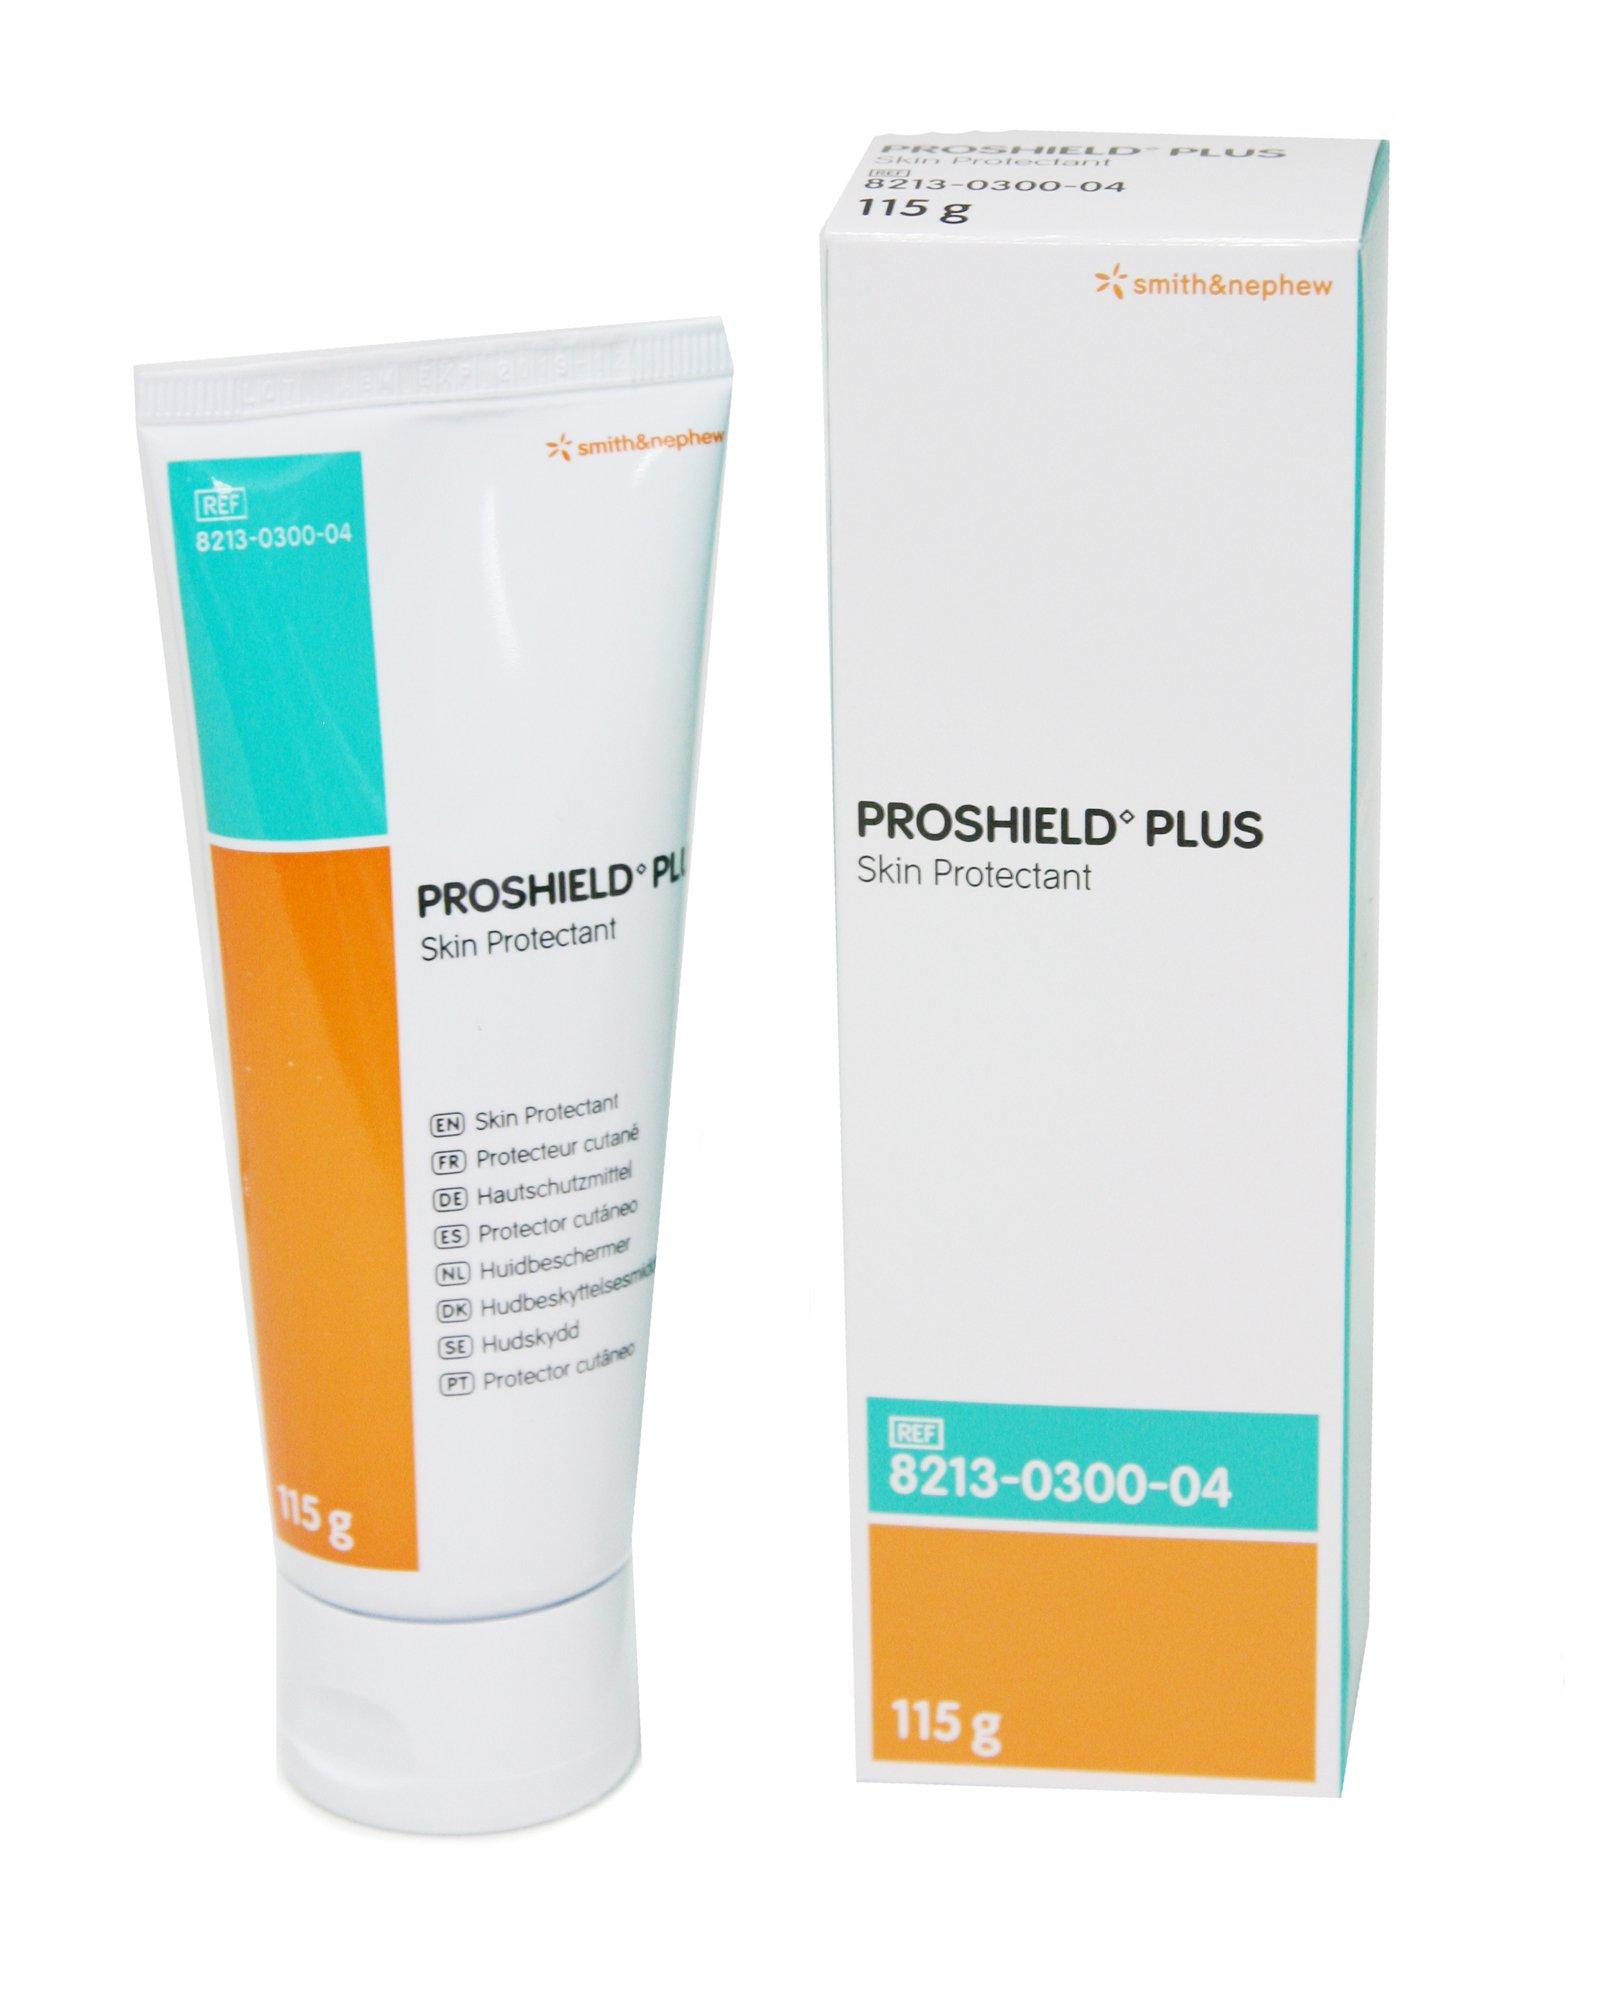 Proshield Plus Skin Protectant, 115g